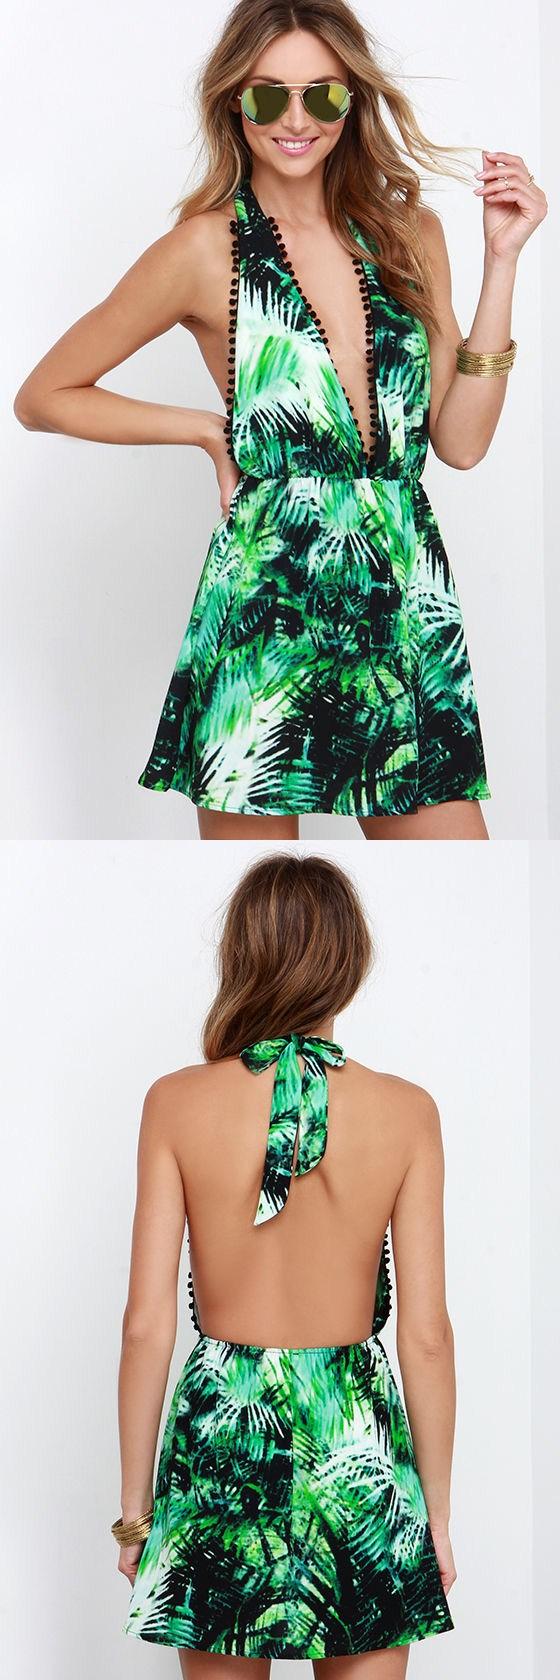 Fronds green tropical print halter dress has a bold botanical print